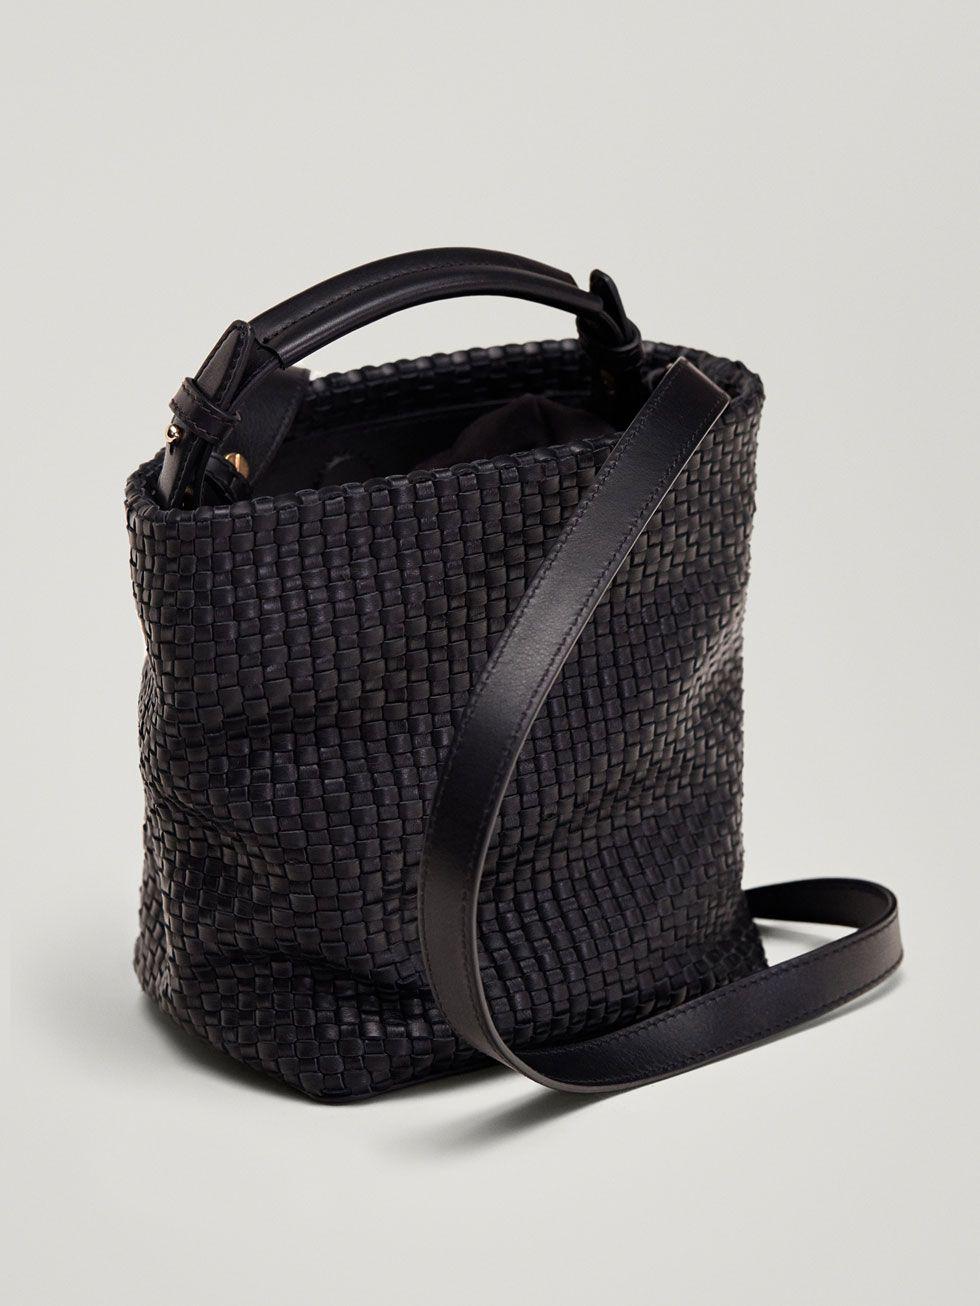 BRAIDED LEATHER CROSSBODY BAG - Women - Massimo Dutti  335f764216e12